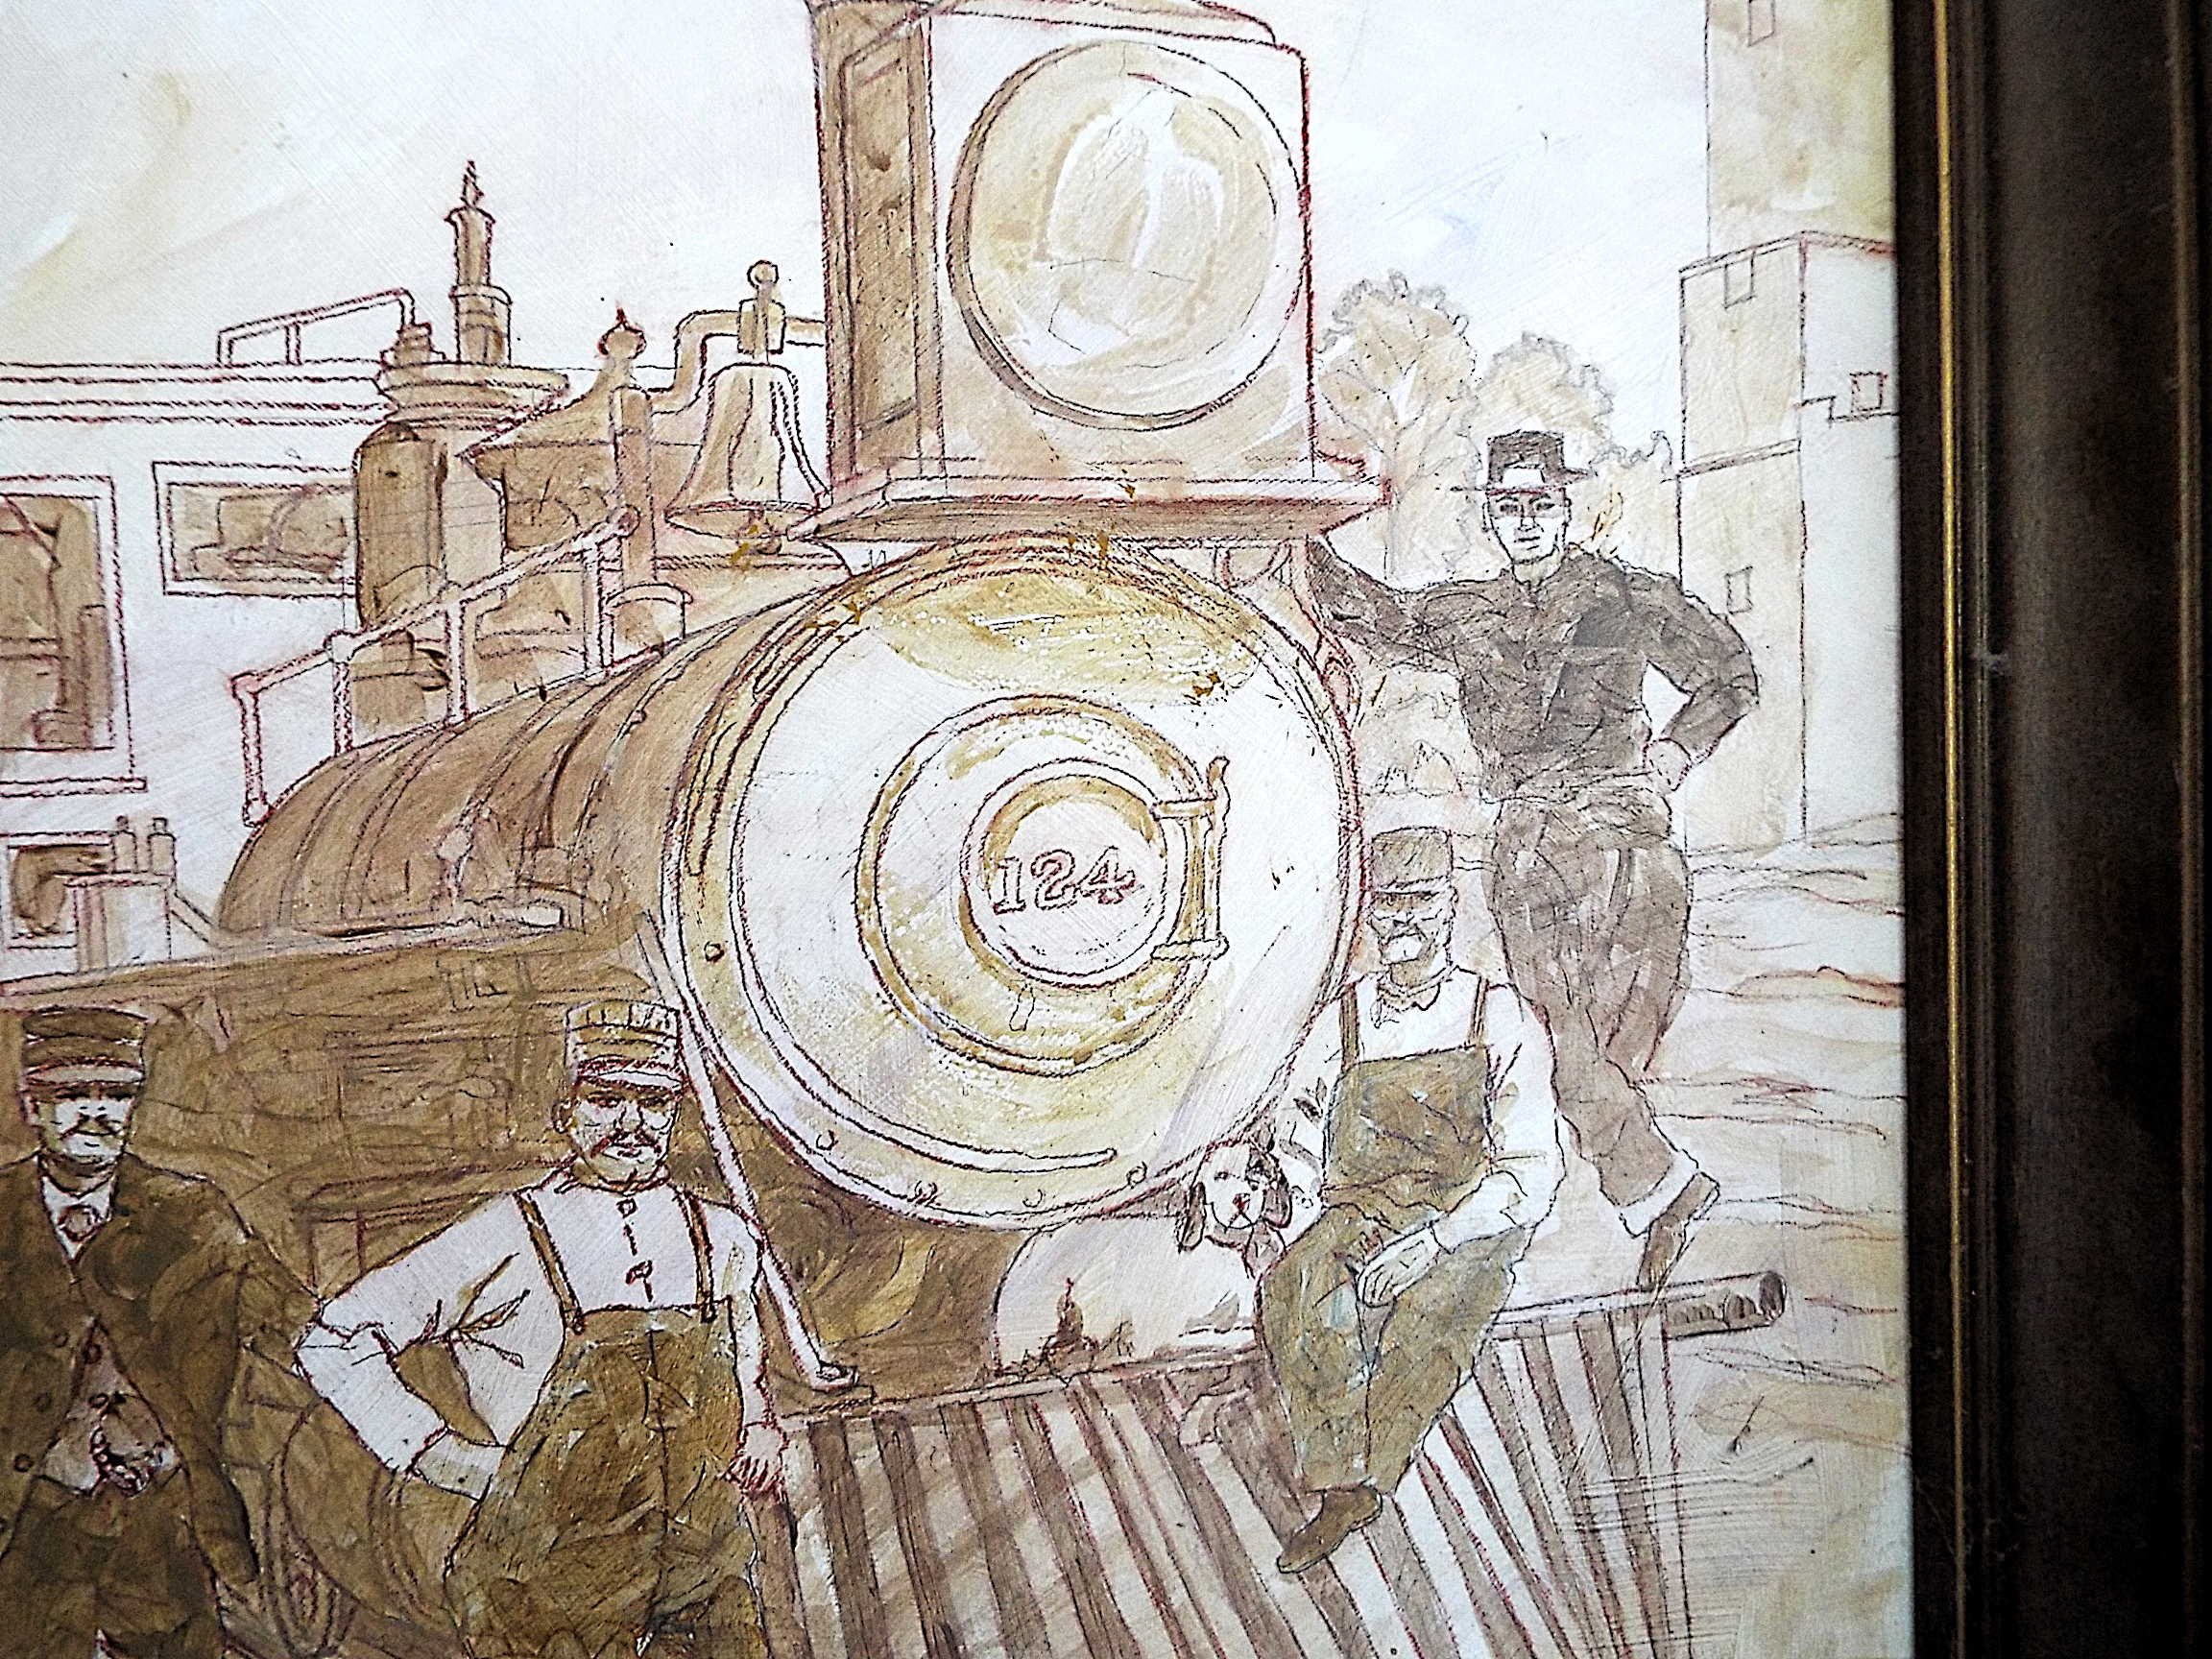 CPRR steam engine #124 pulling an emigrant train through Trotwood Ohio